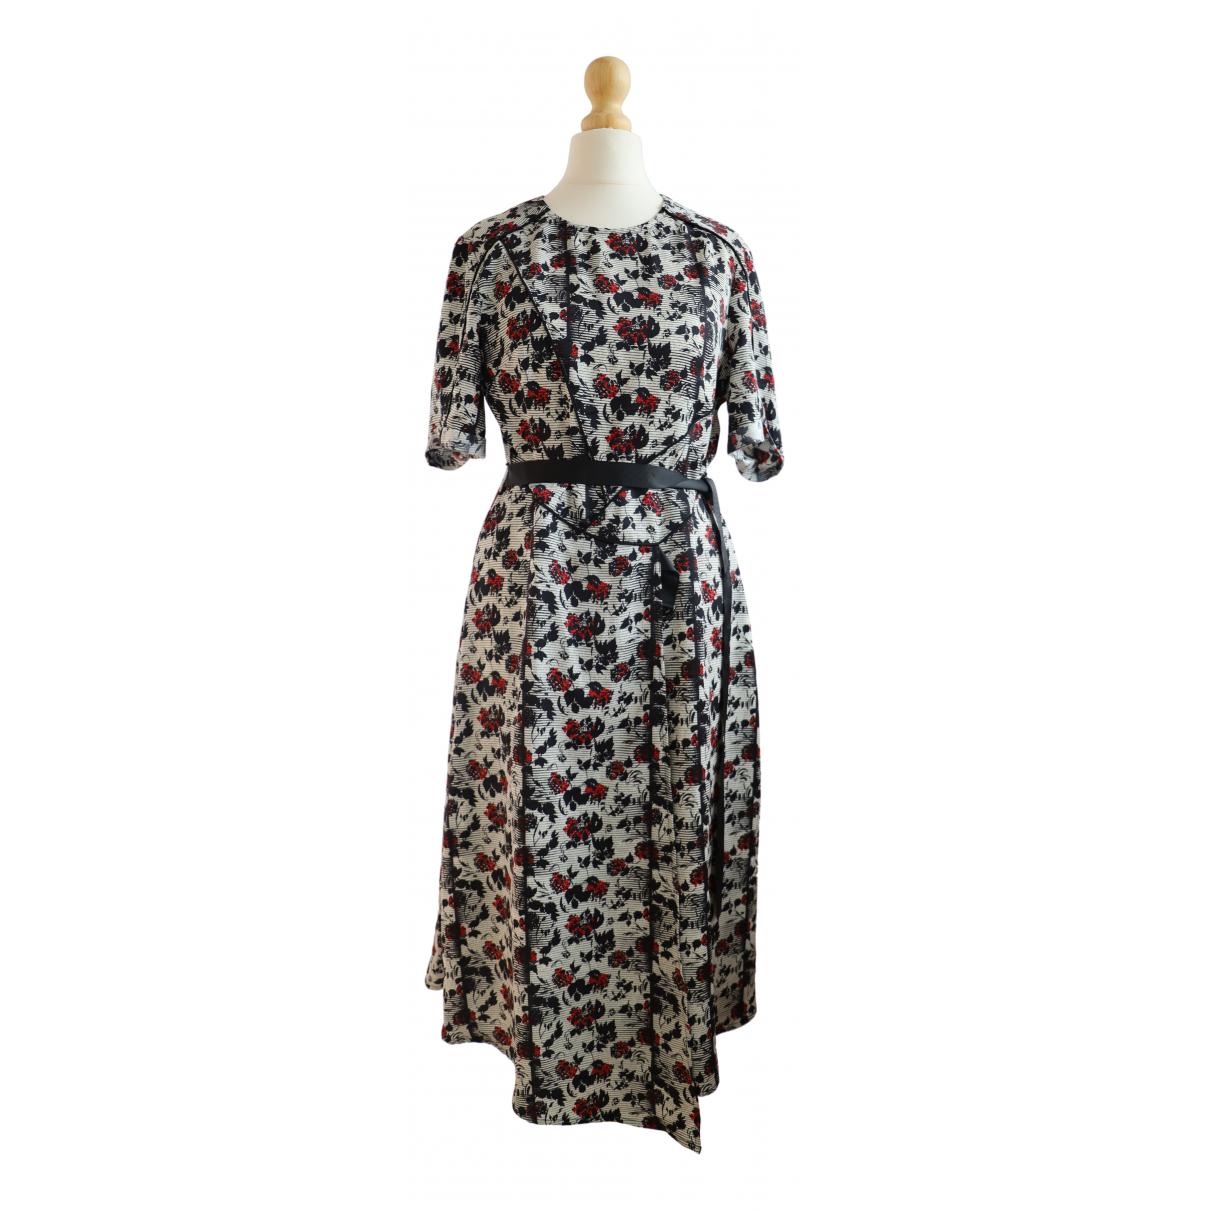 Tophop \N Kleid in  Weiss Polyester